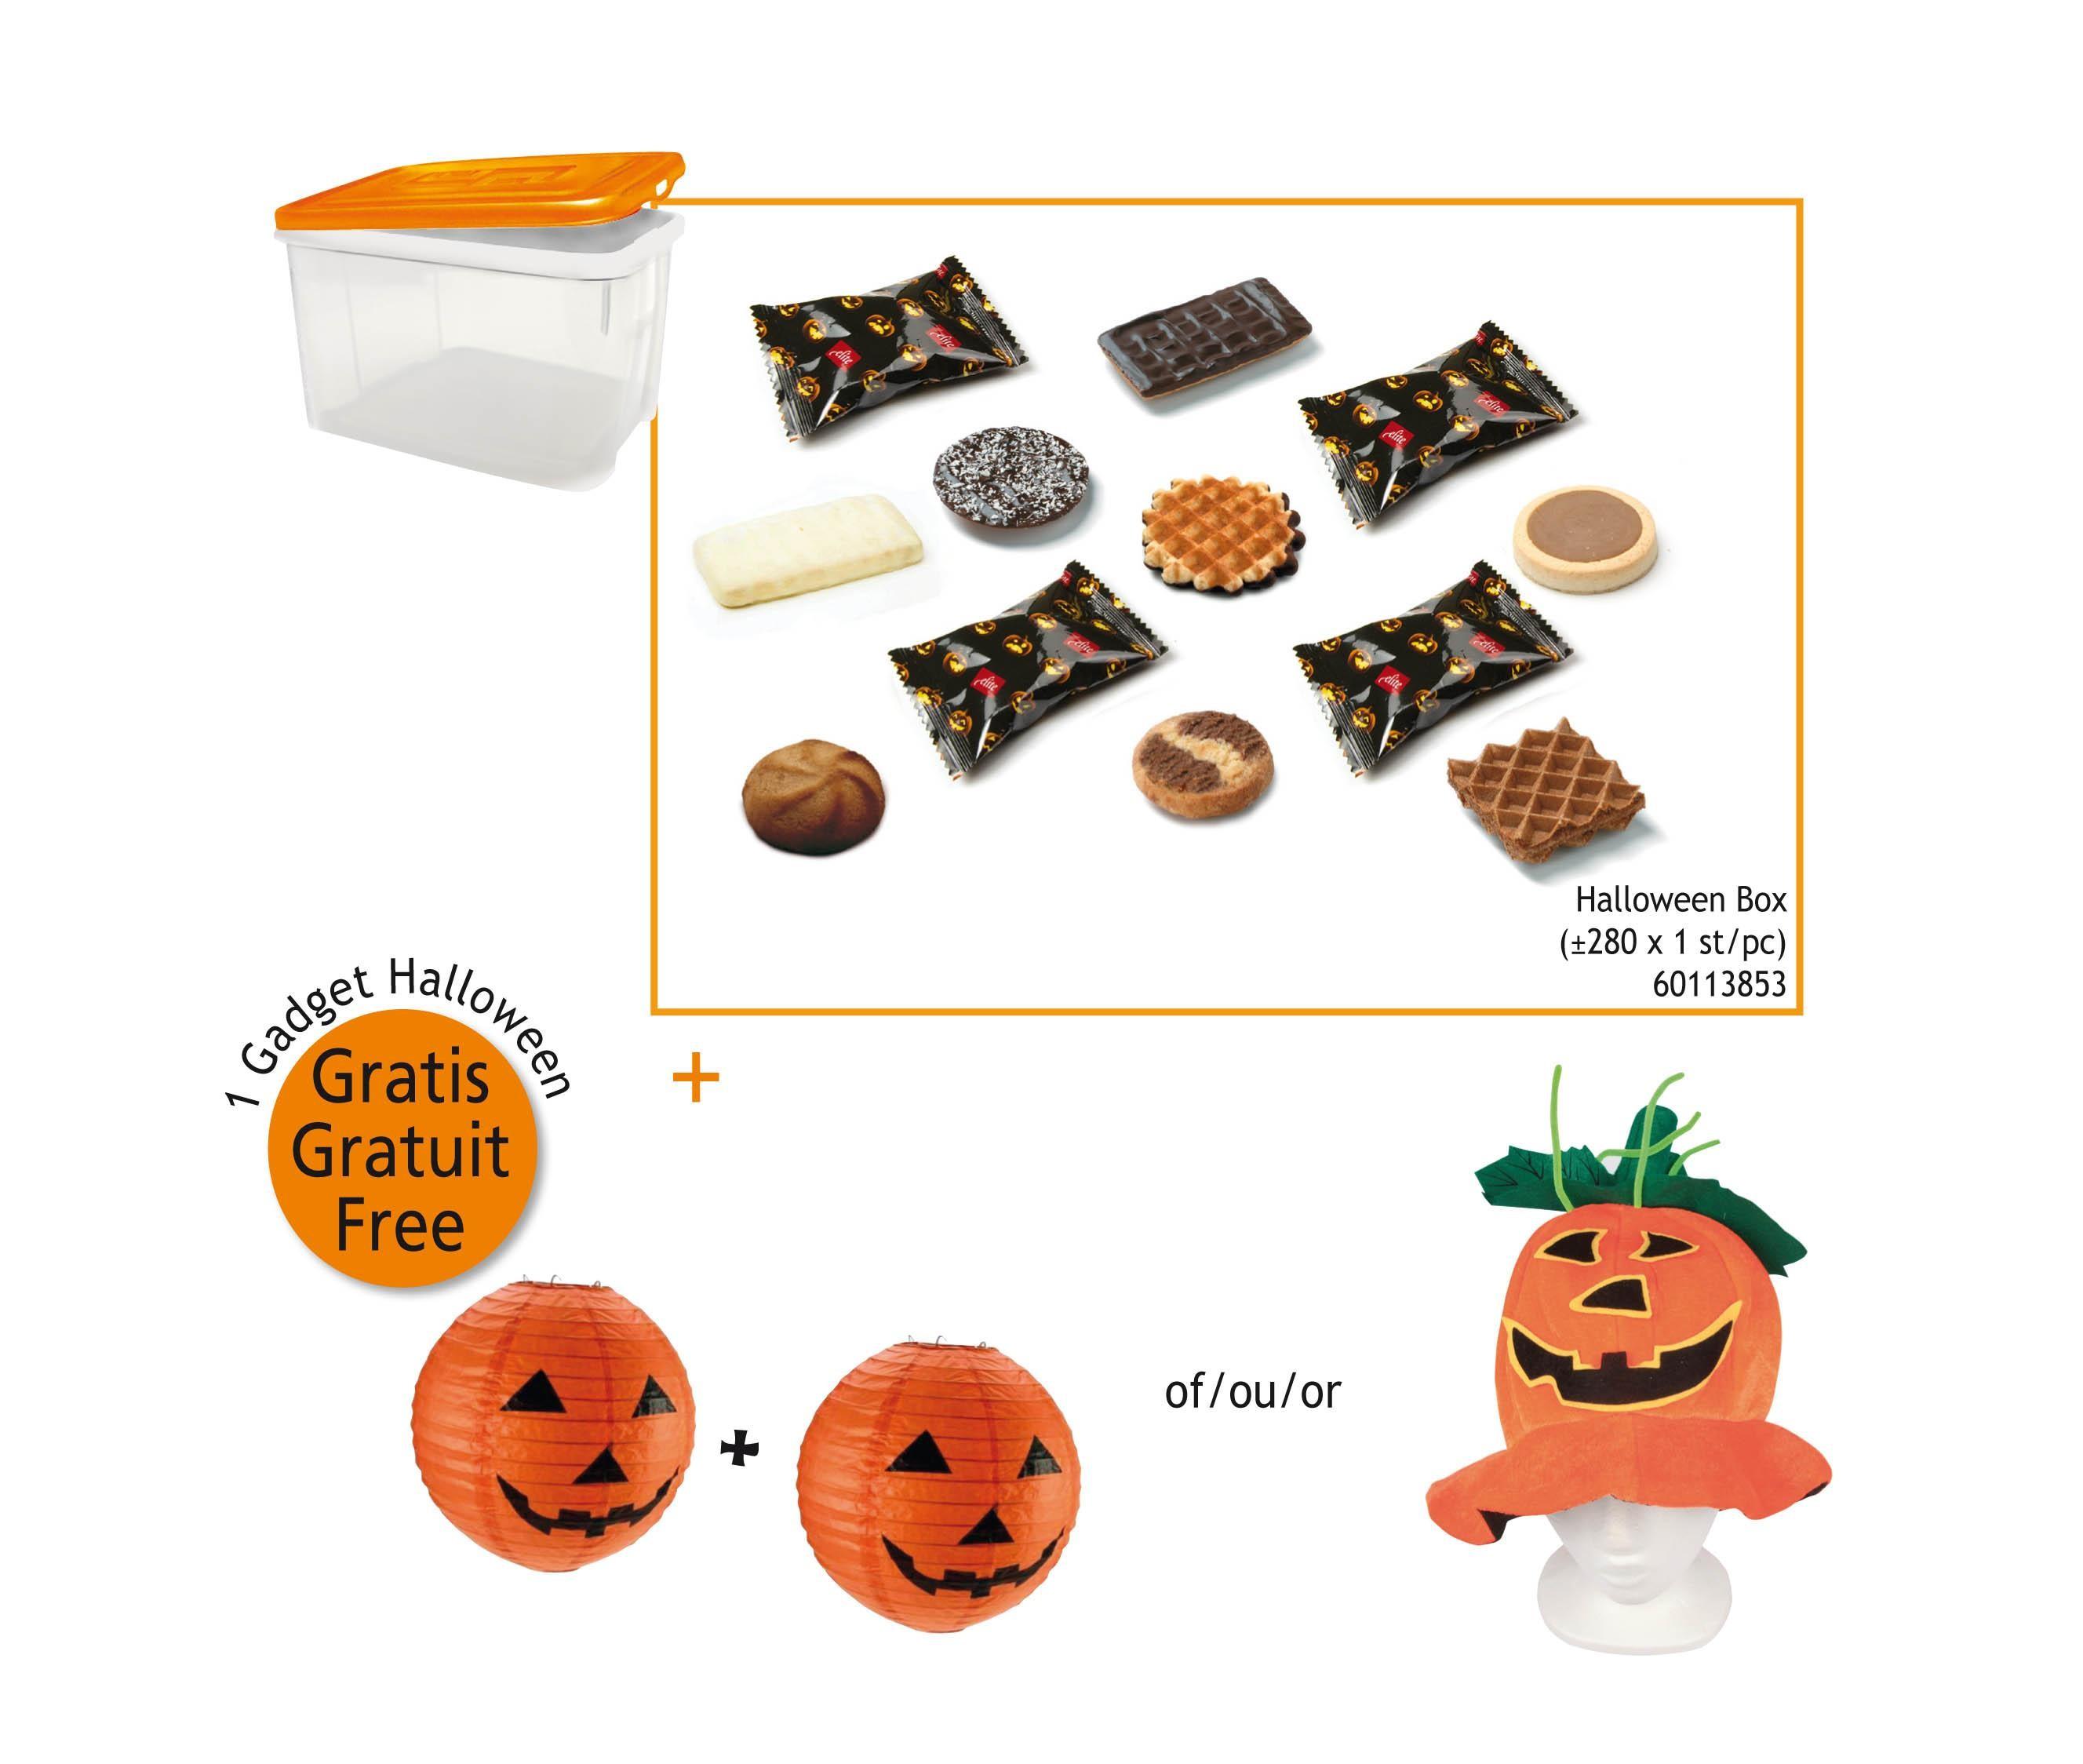 Elite Biscuits Halloween 280pc box